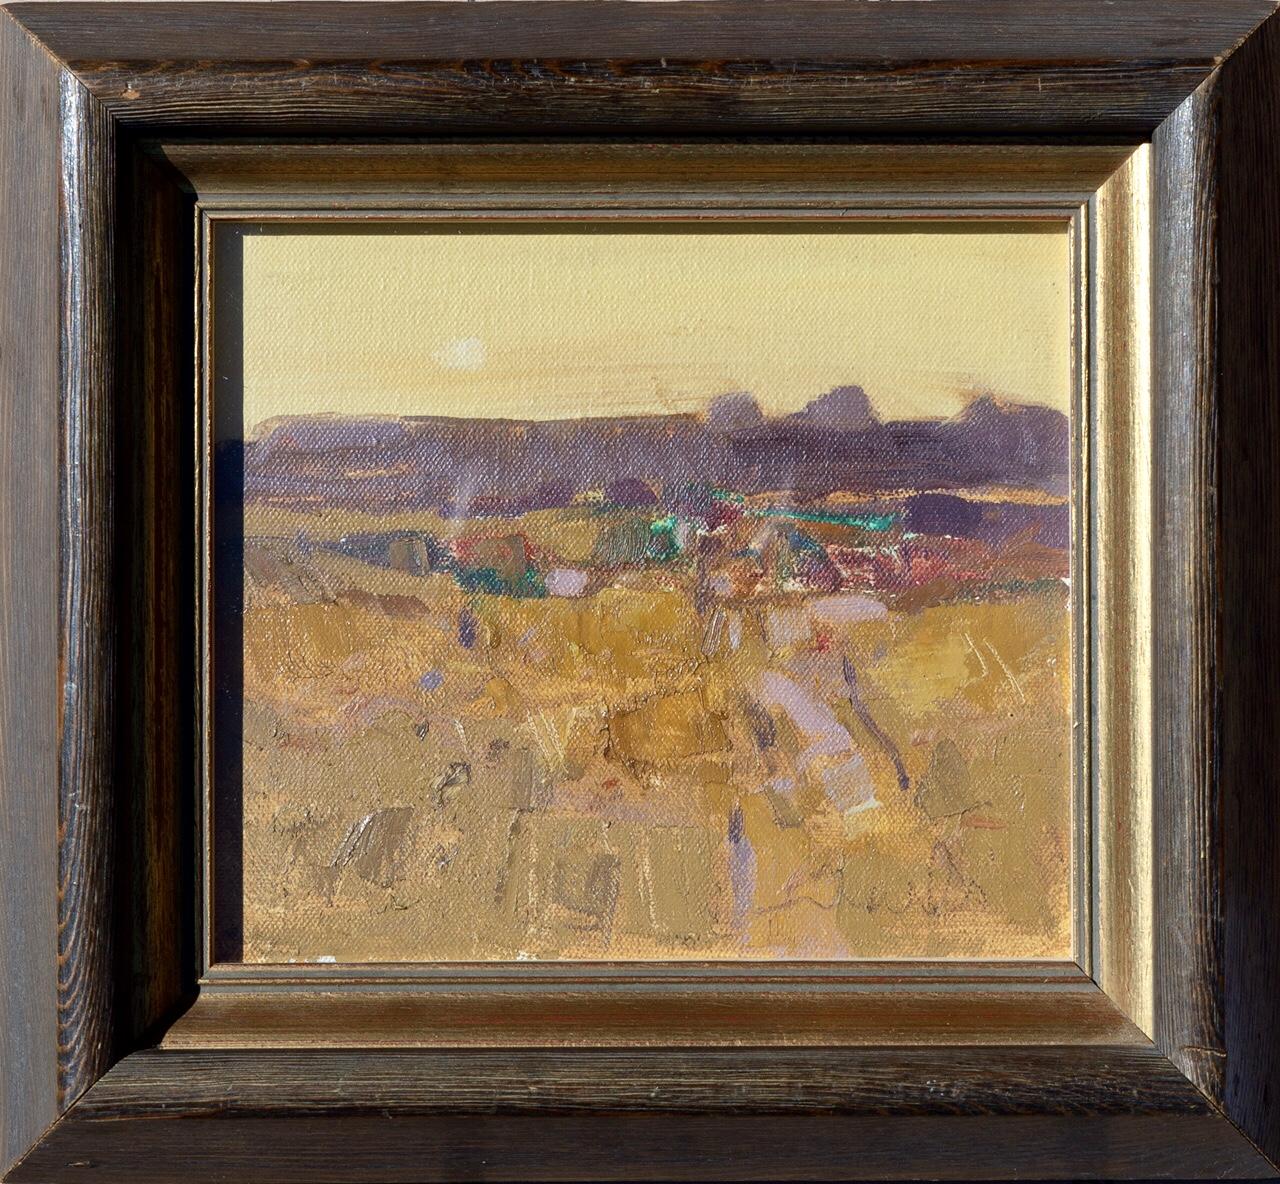 GEORGE DEVLIN RSW RGI FRSA (SCOTTISH 1937 - 2014), Evening, Signed Oil Painting